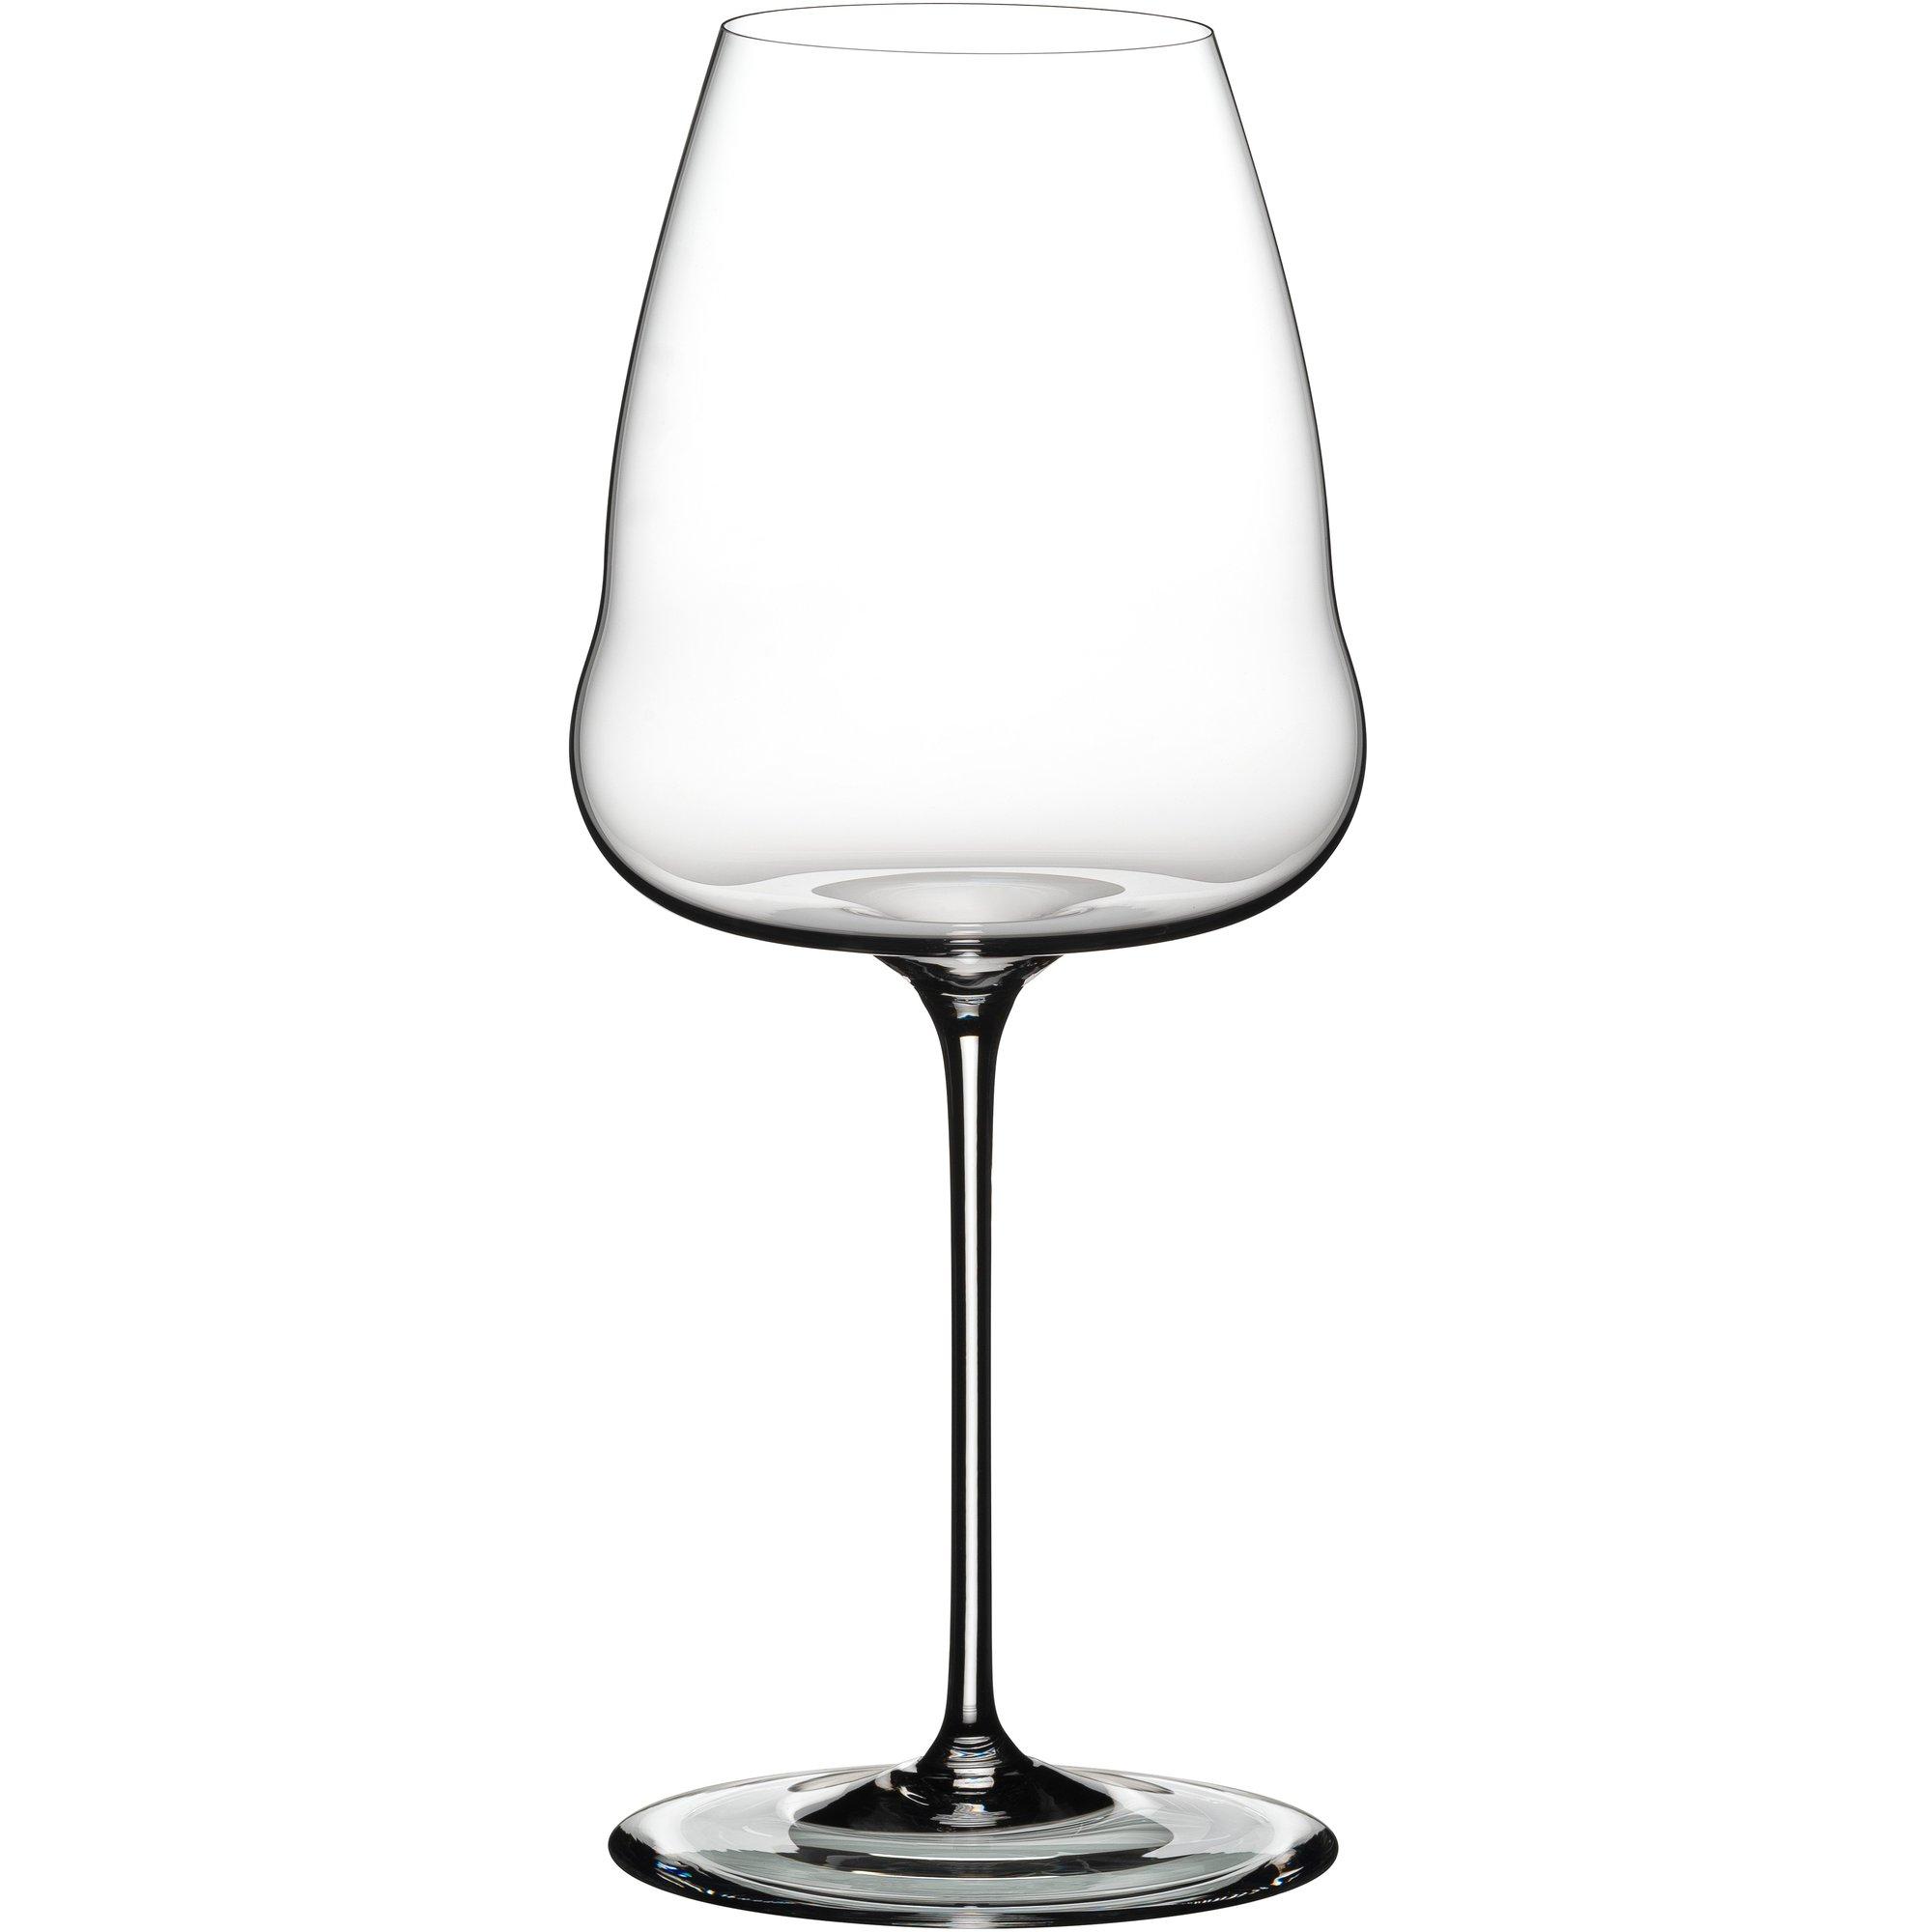 Riedel Winewings vitvinsglas till Sauvigno Blanc